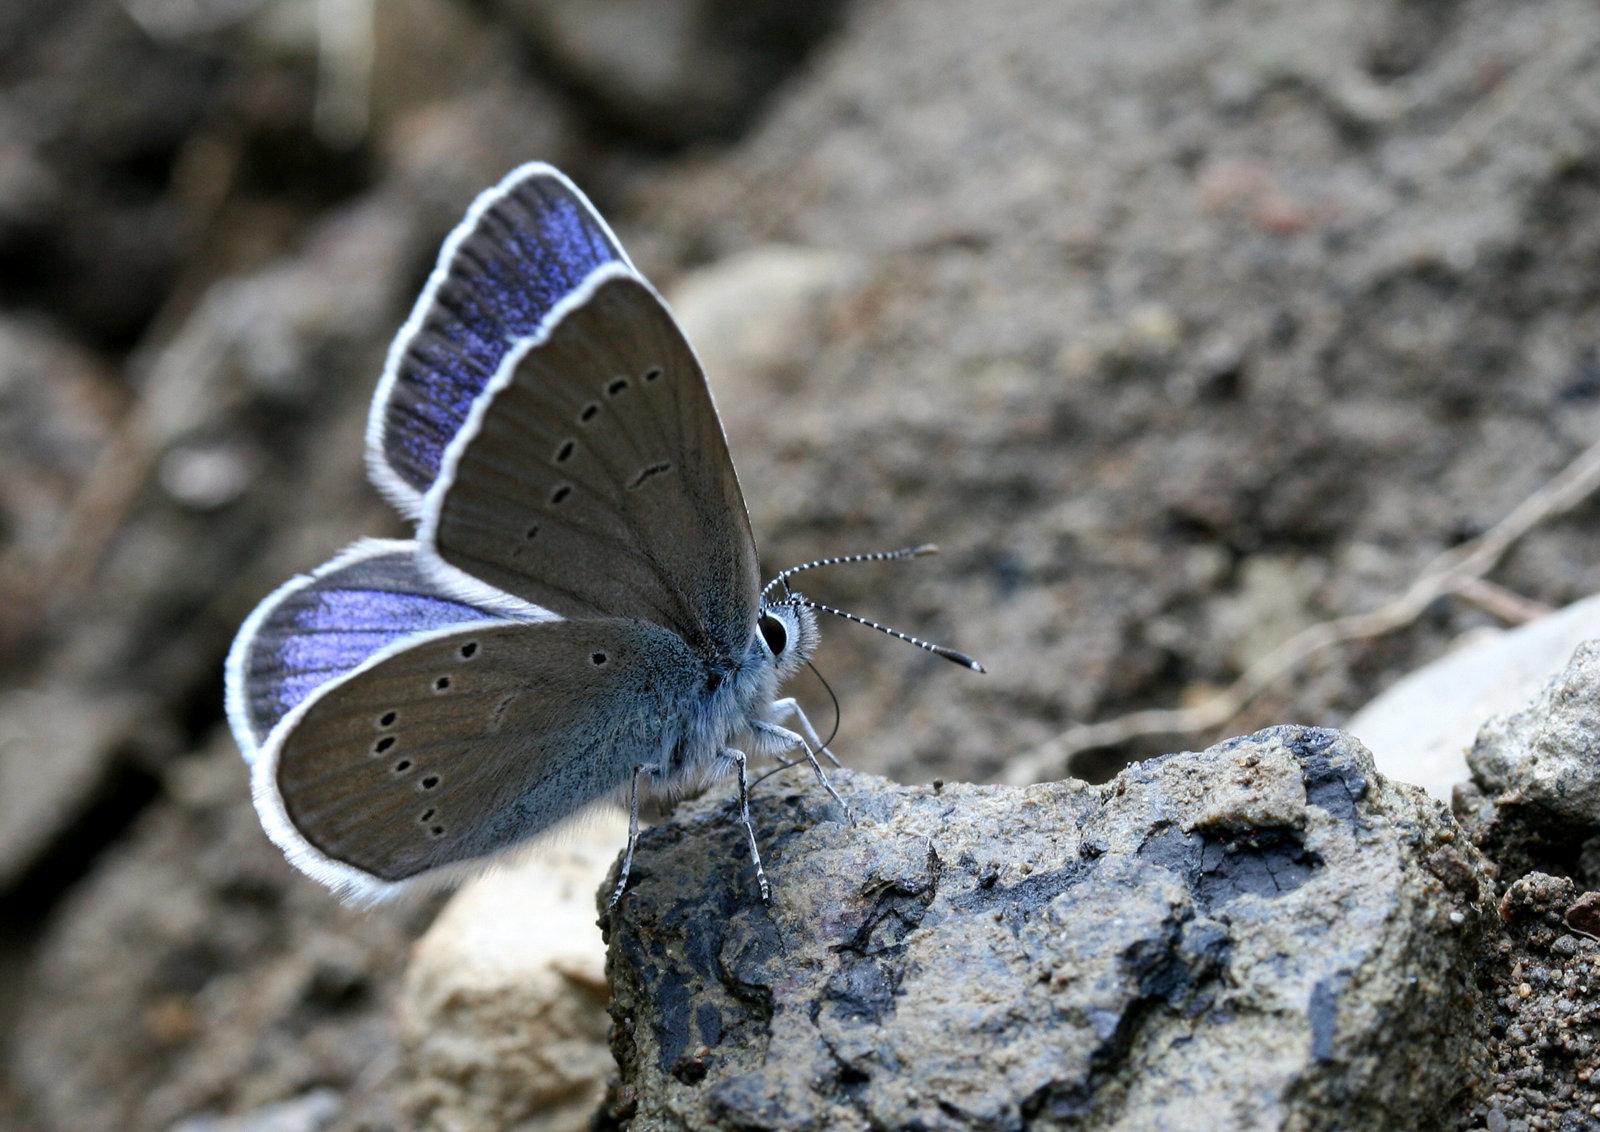 Engblåfugl, Cyaniris semiargus